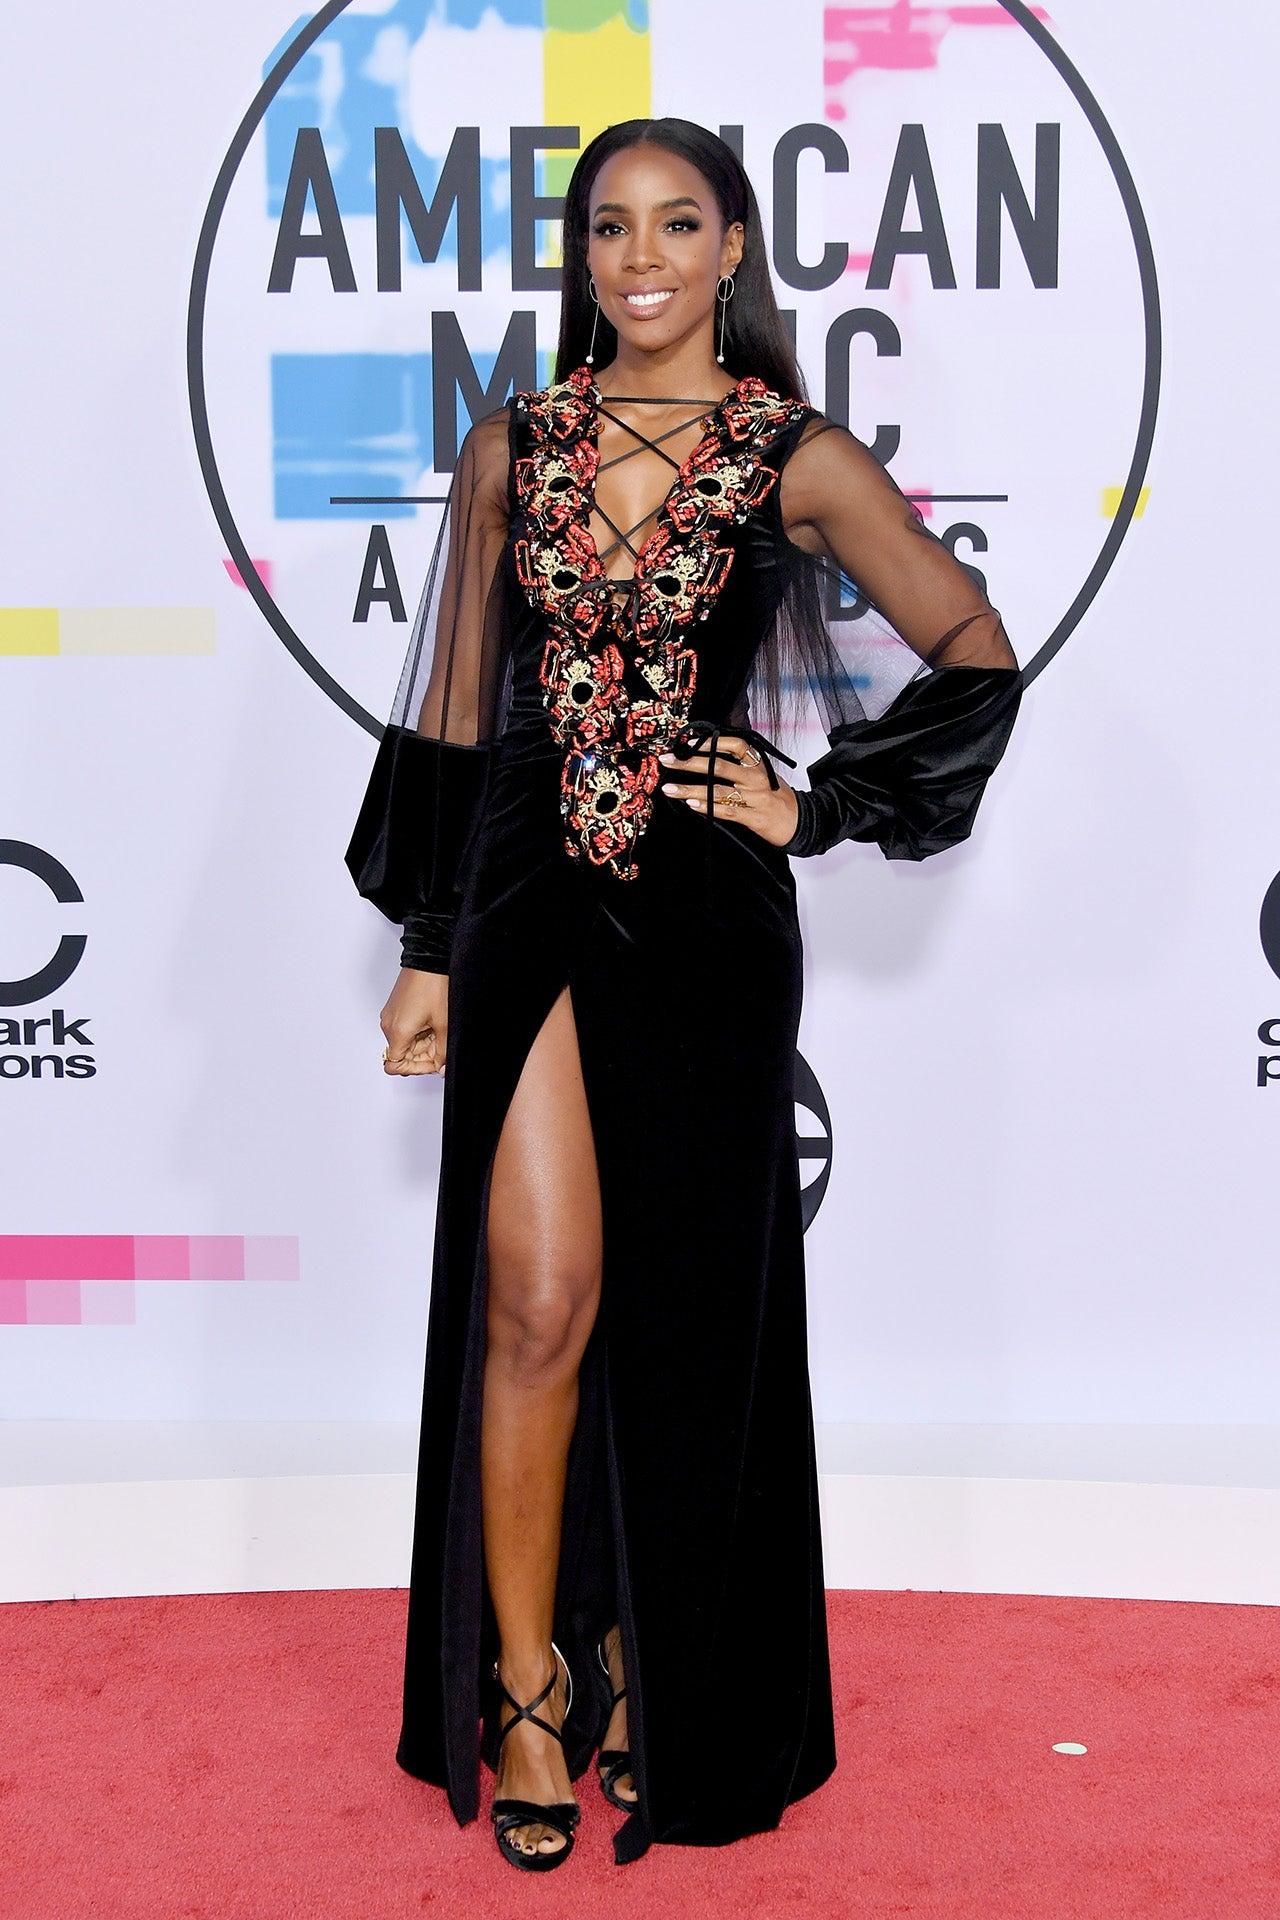 Kelly Rowland at the AMAs